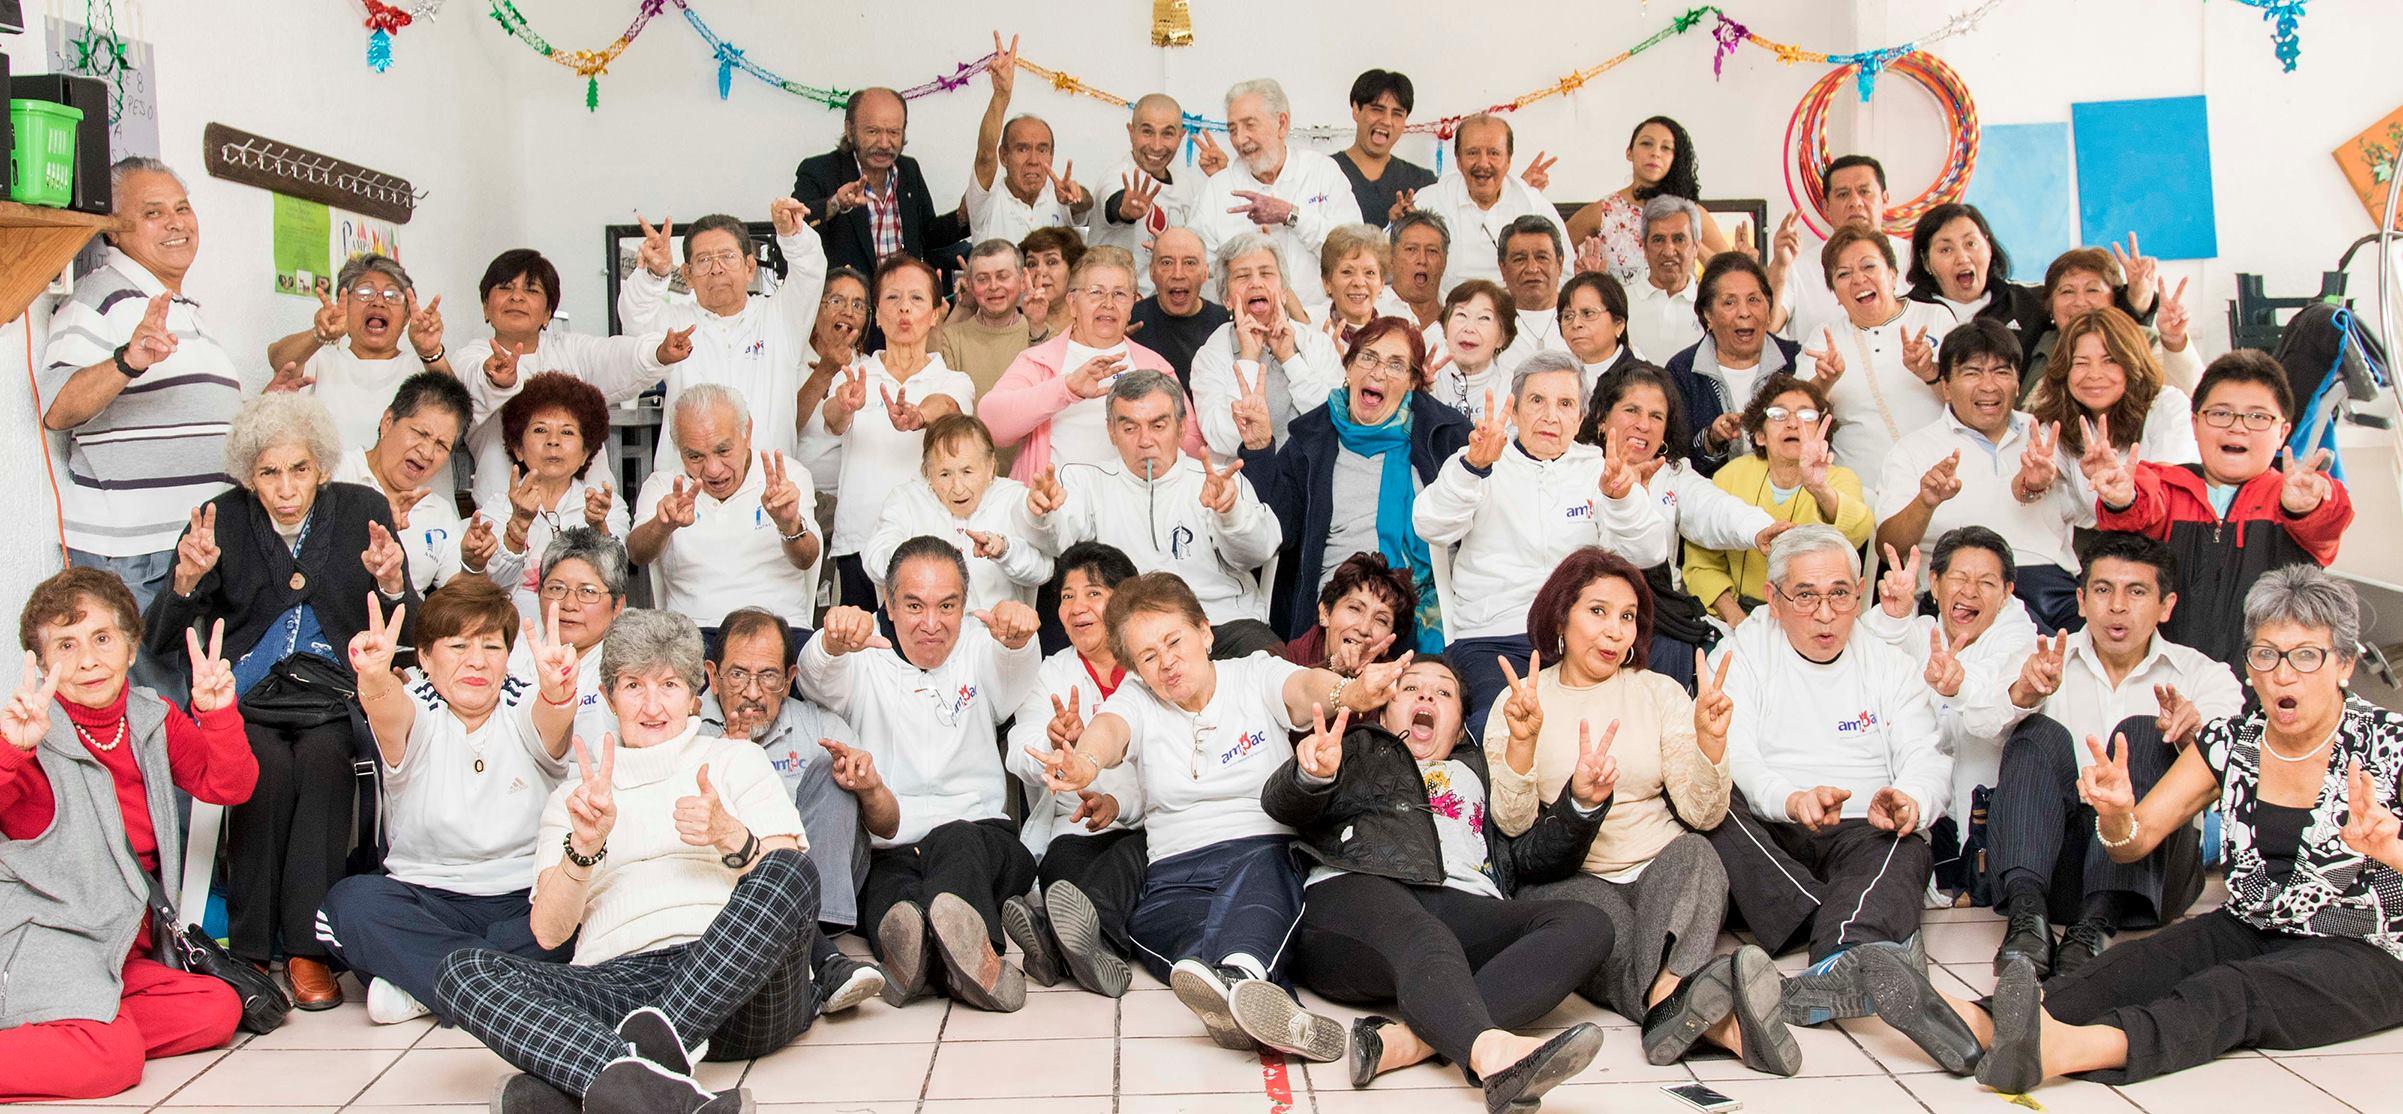 El parkinson segunda enfermedad neurodegenerativa en México